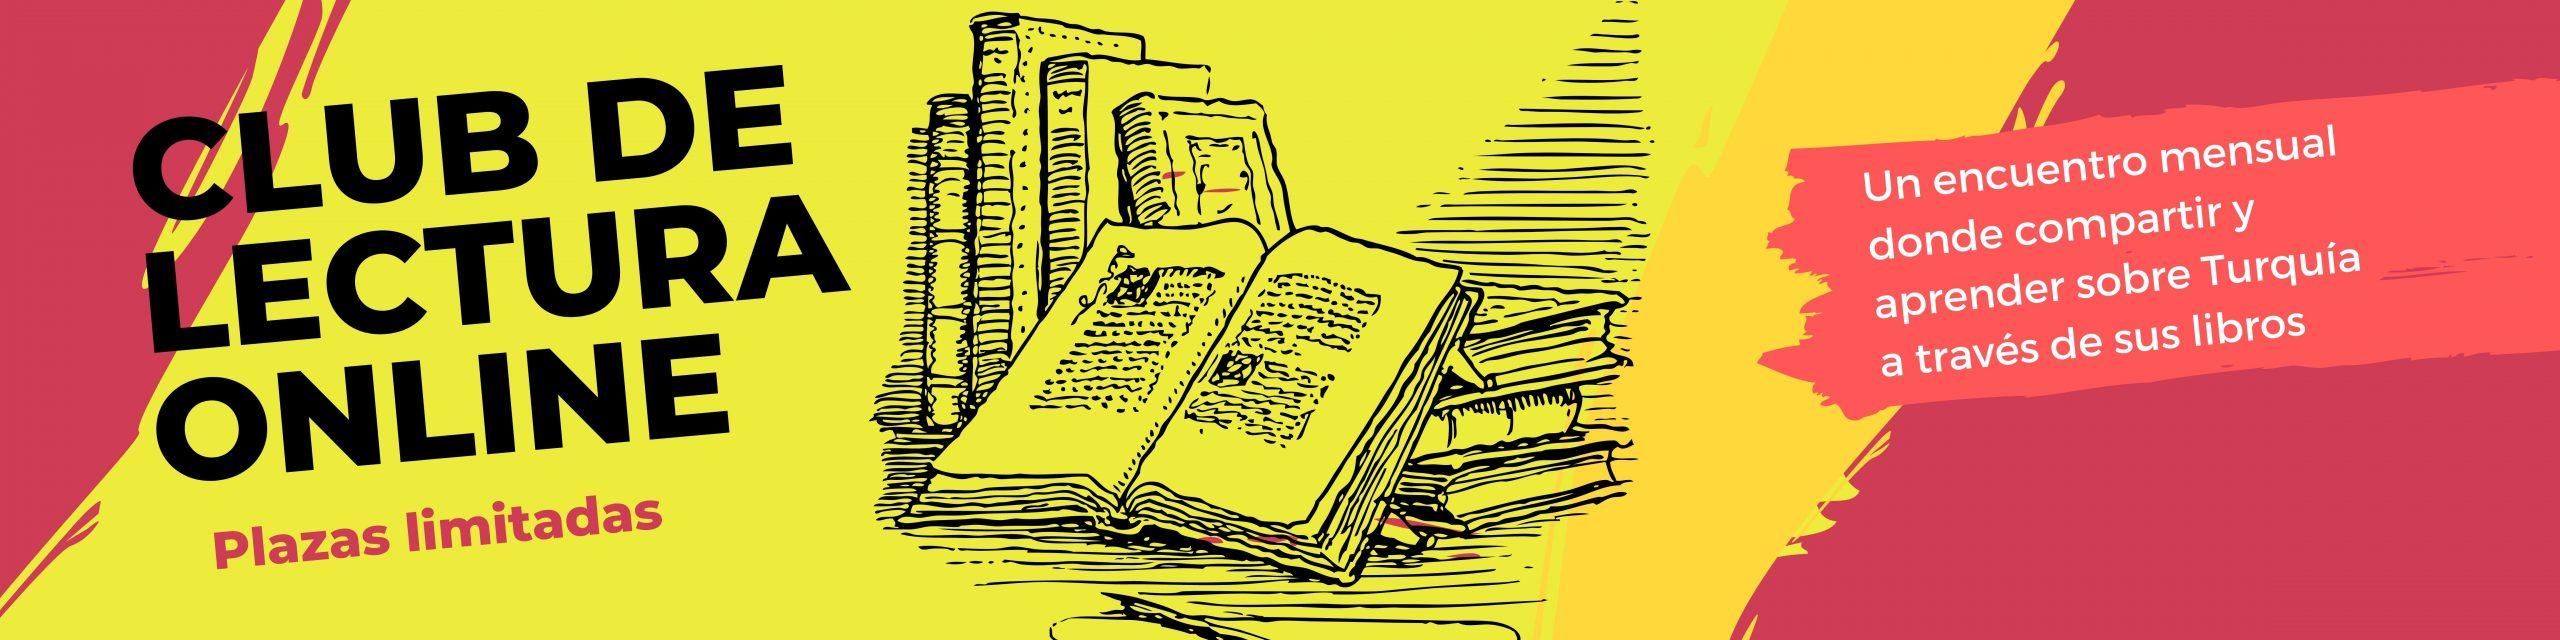 banner club de lectura turqui